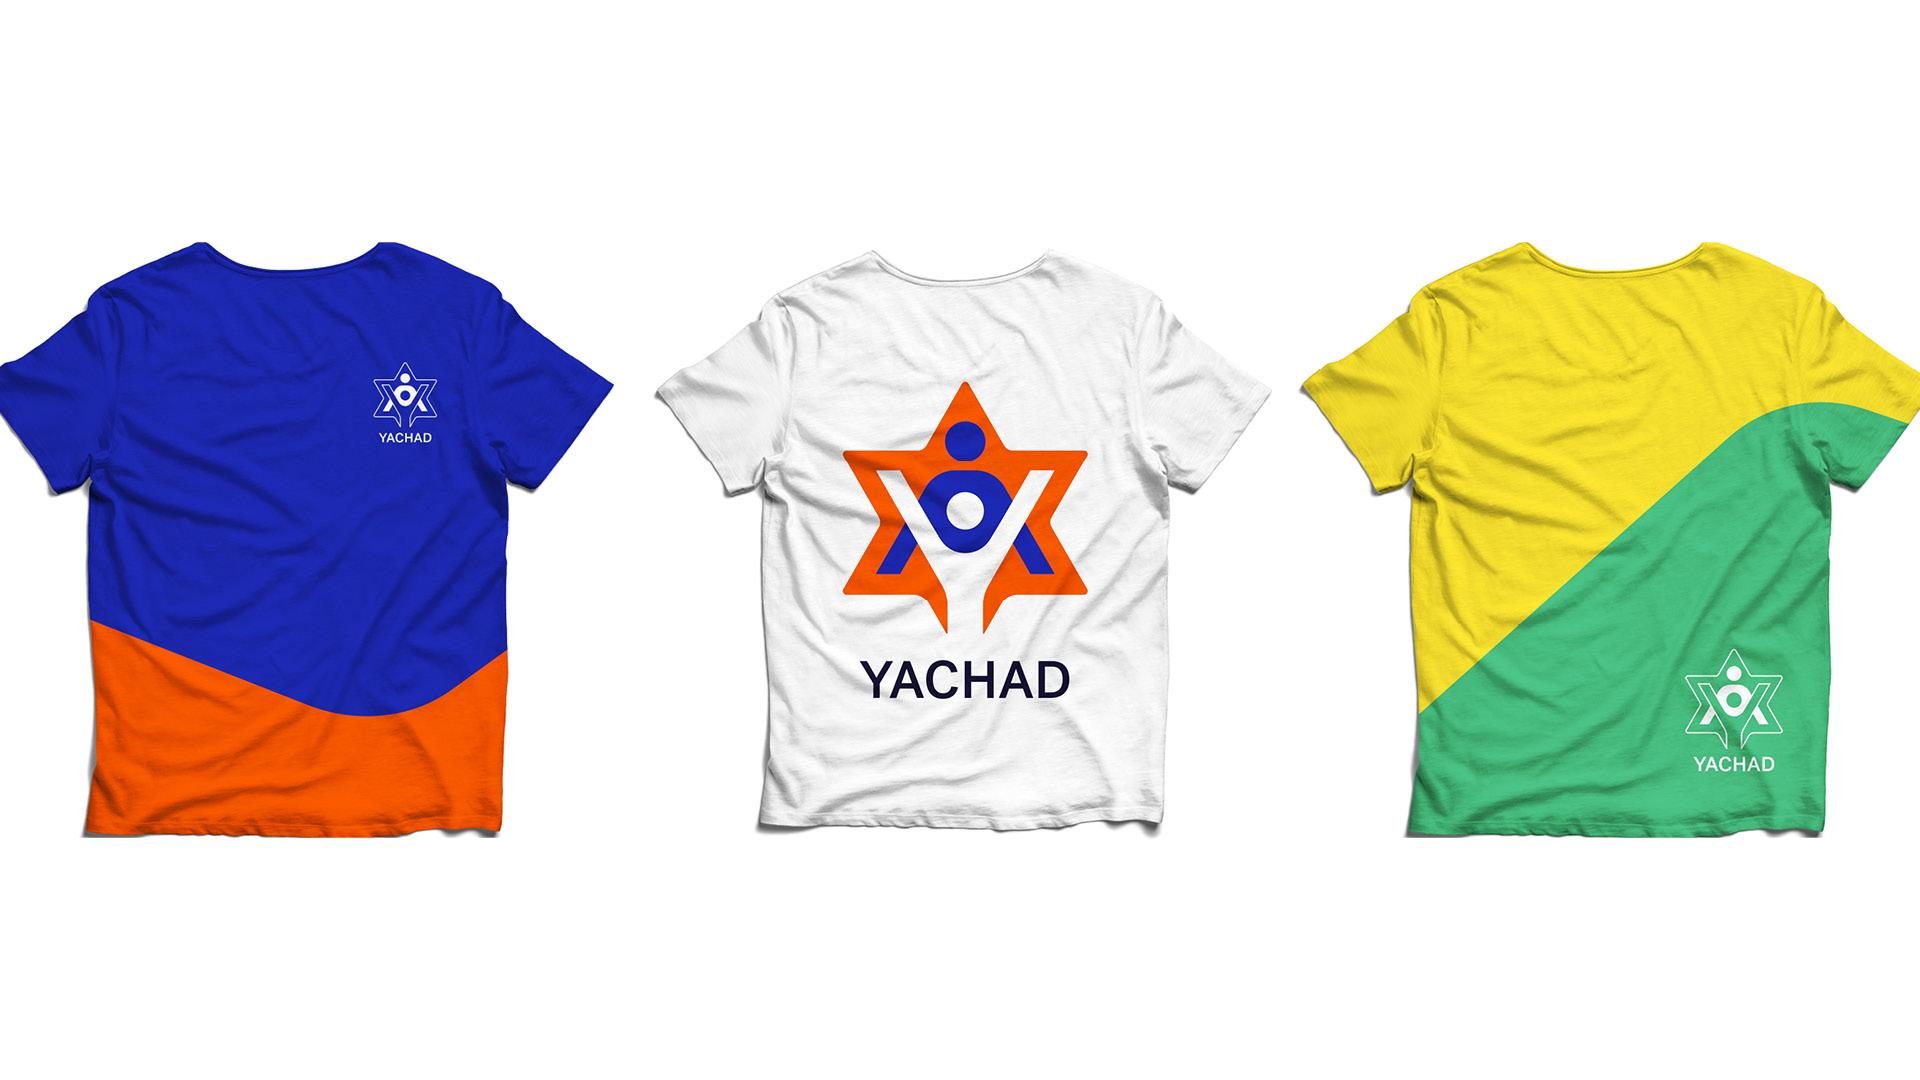 Yachad-Case-Study17